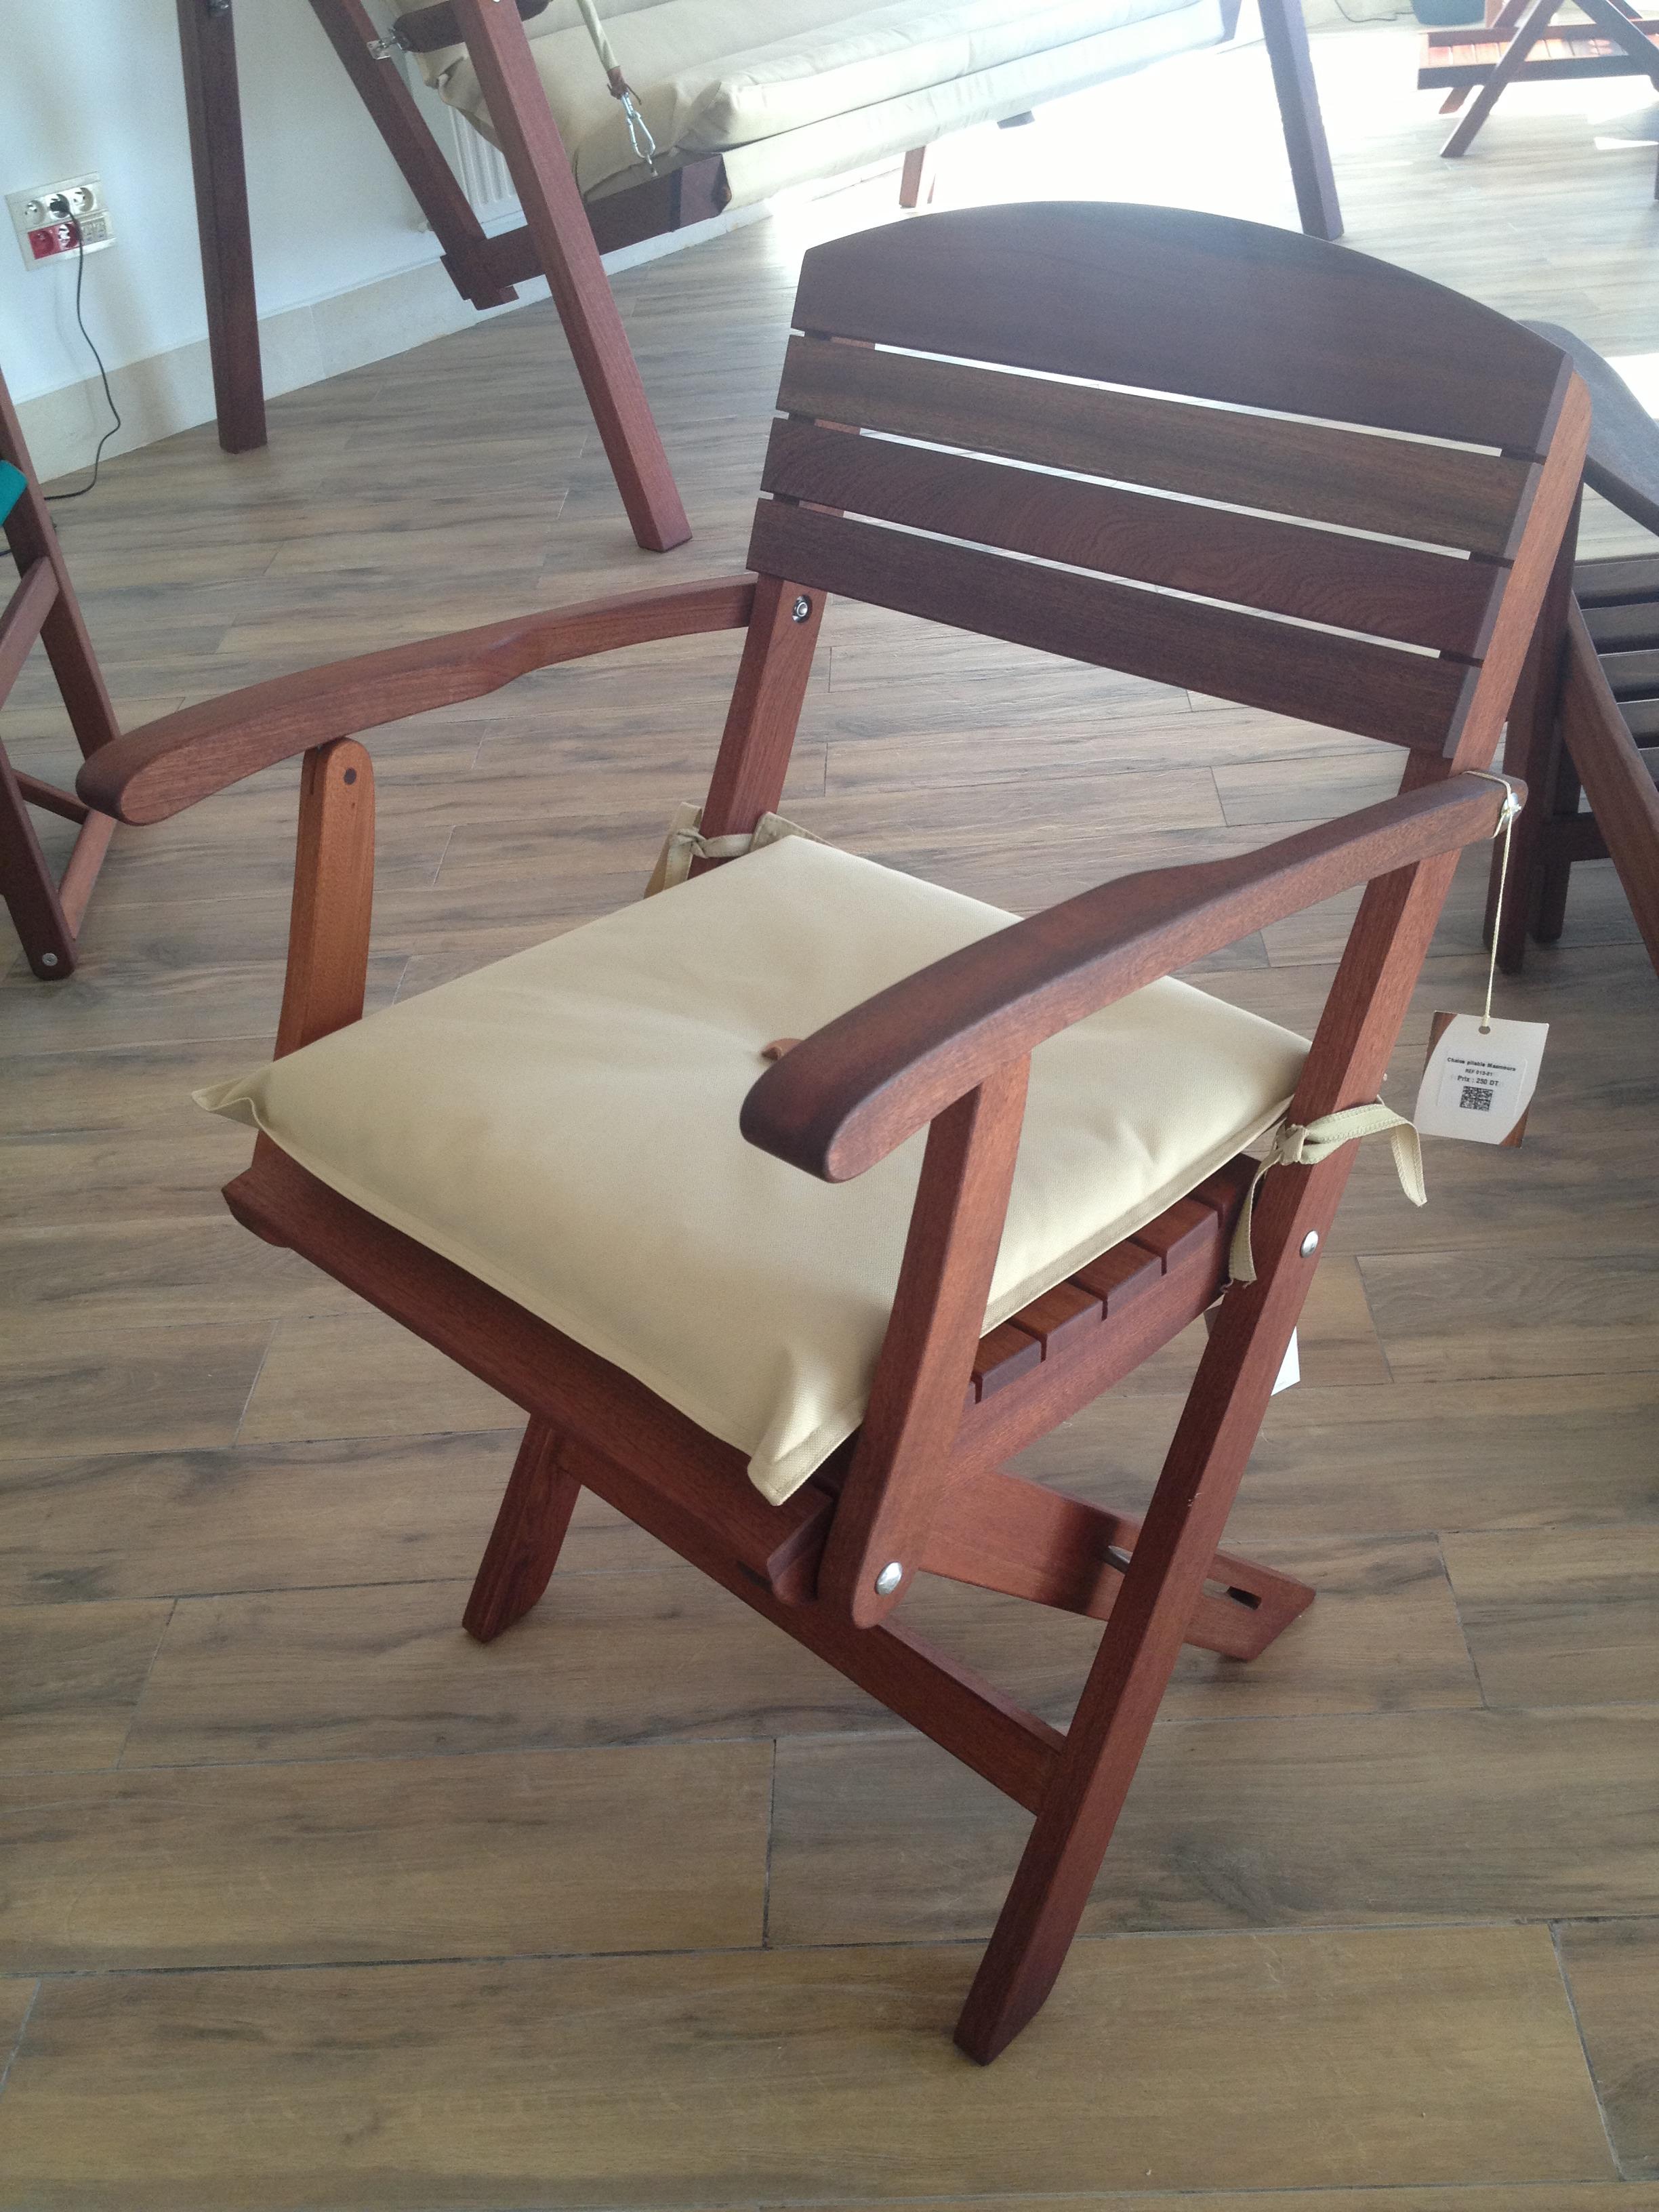 Chaise pliable maamoura avec accoudoirs meubles et for Chaise pliable